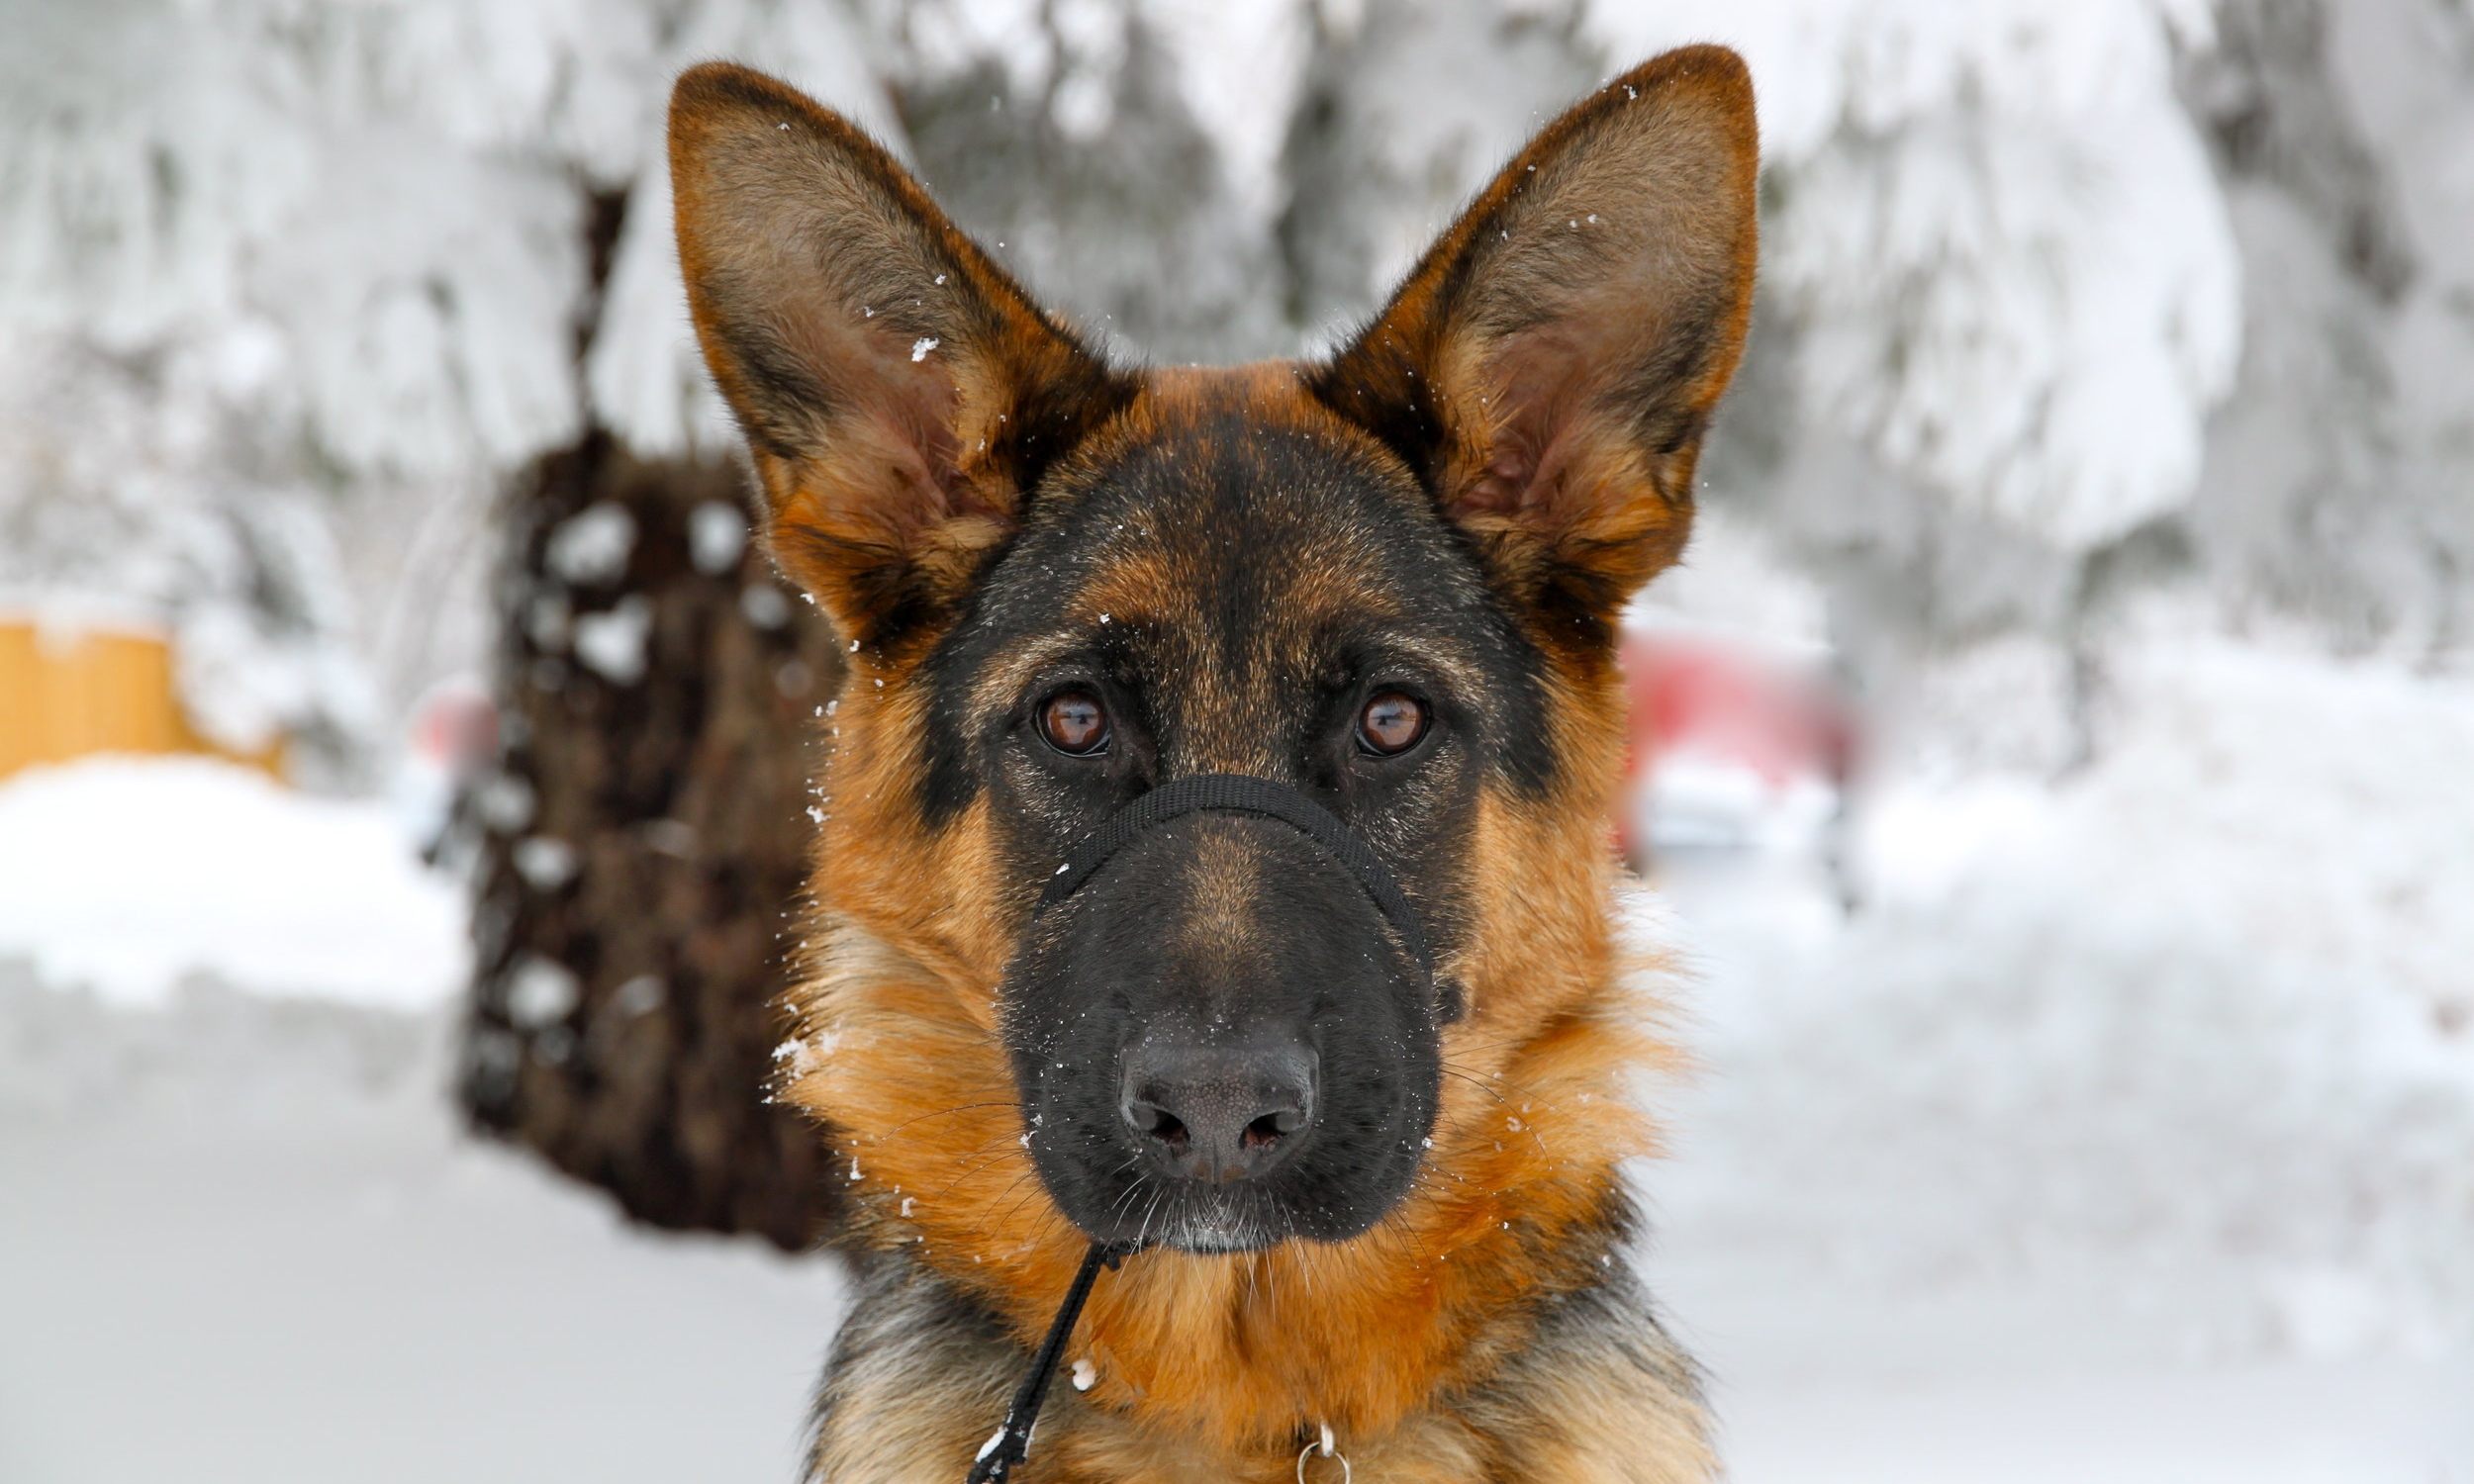 ... Tellie, training during sun or snow